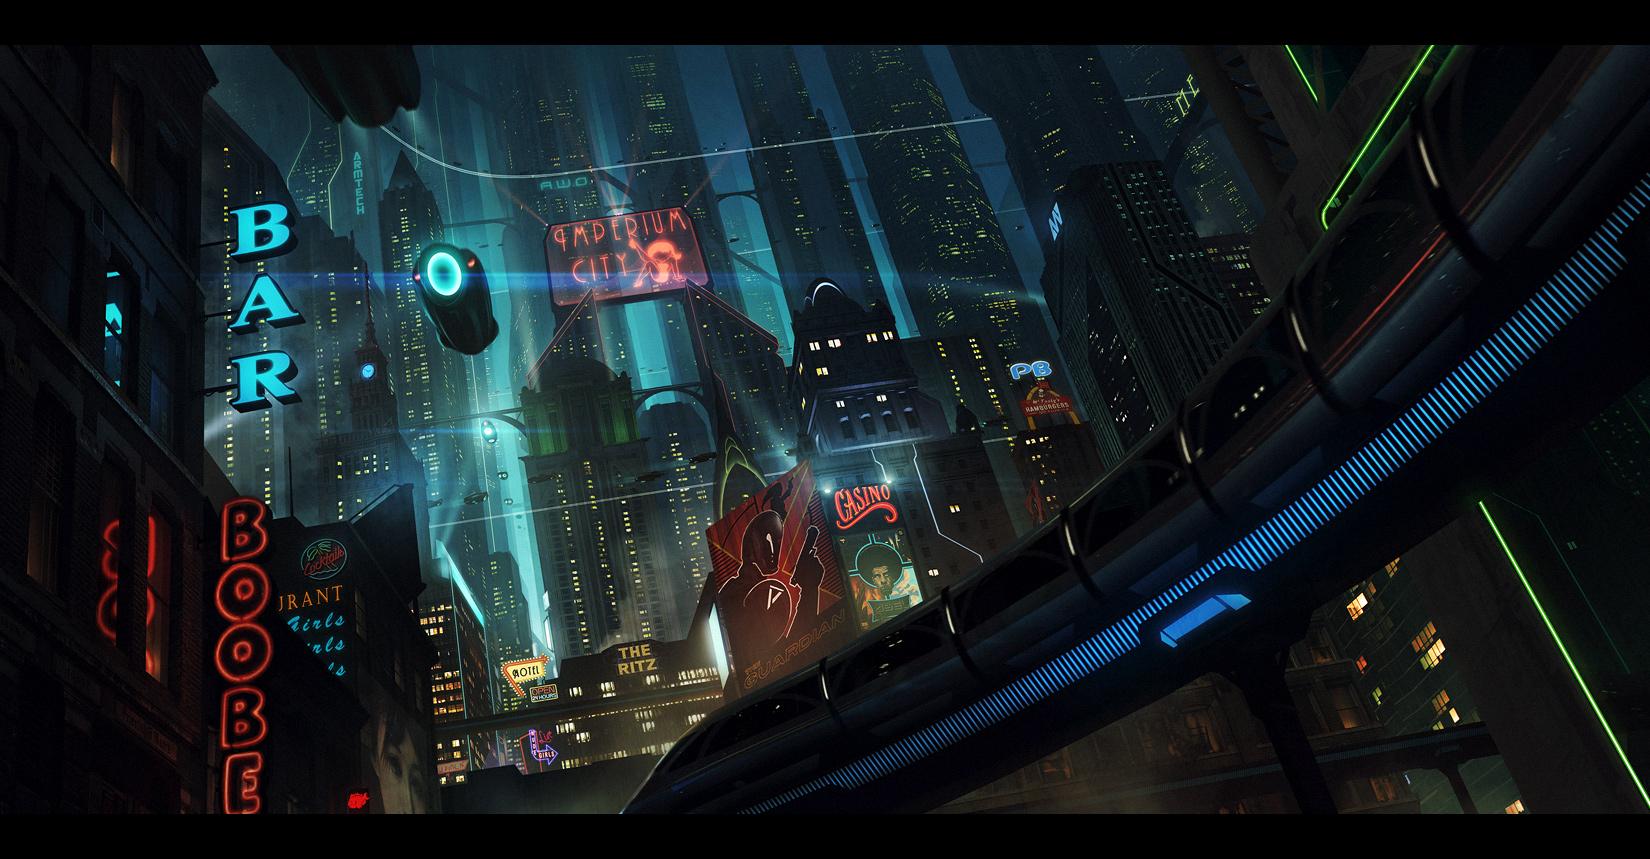 cyberpunk city hd wallpapers - photo #37